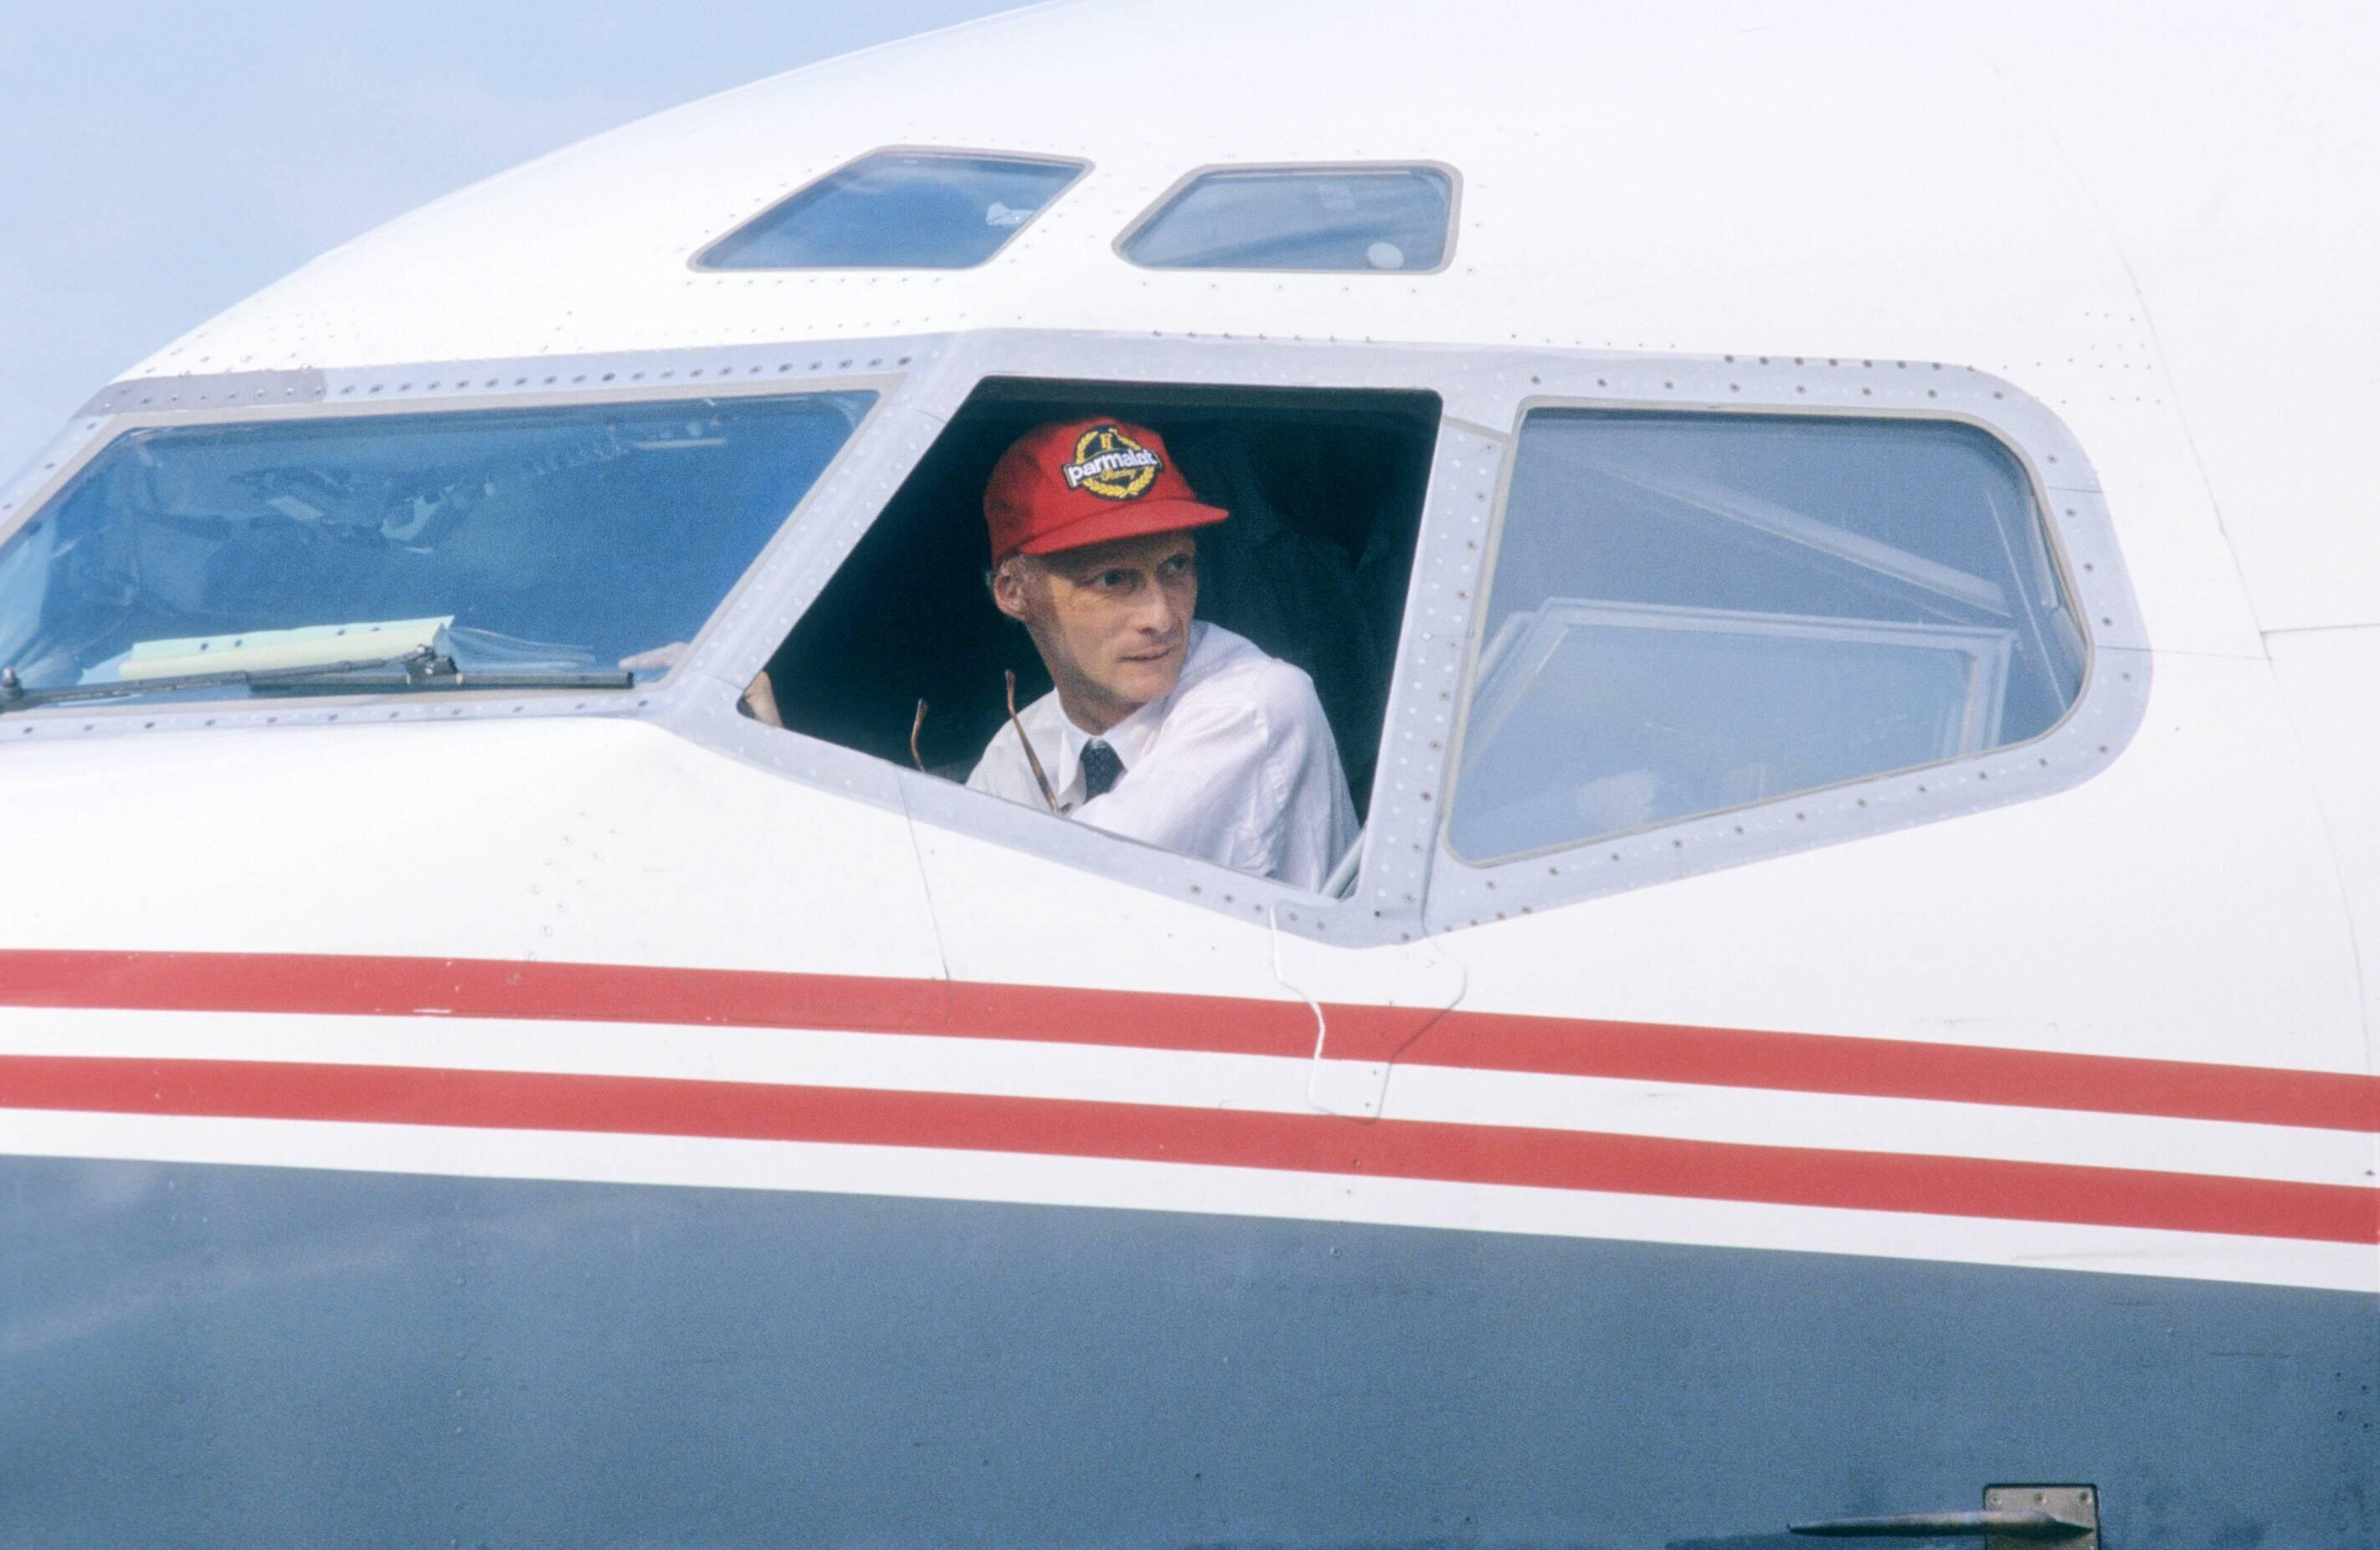 Bild zu Niki Lauda, Flugzeug, Lauda Air, Luftfahrt, 1987